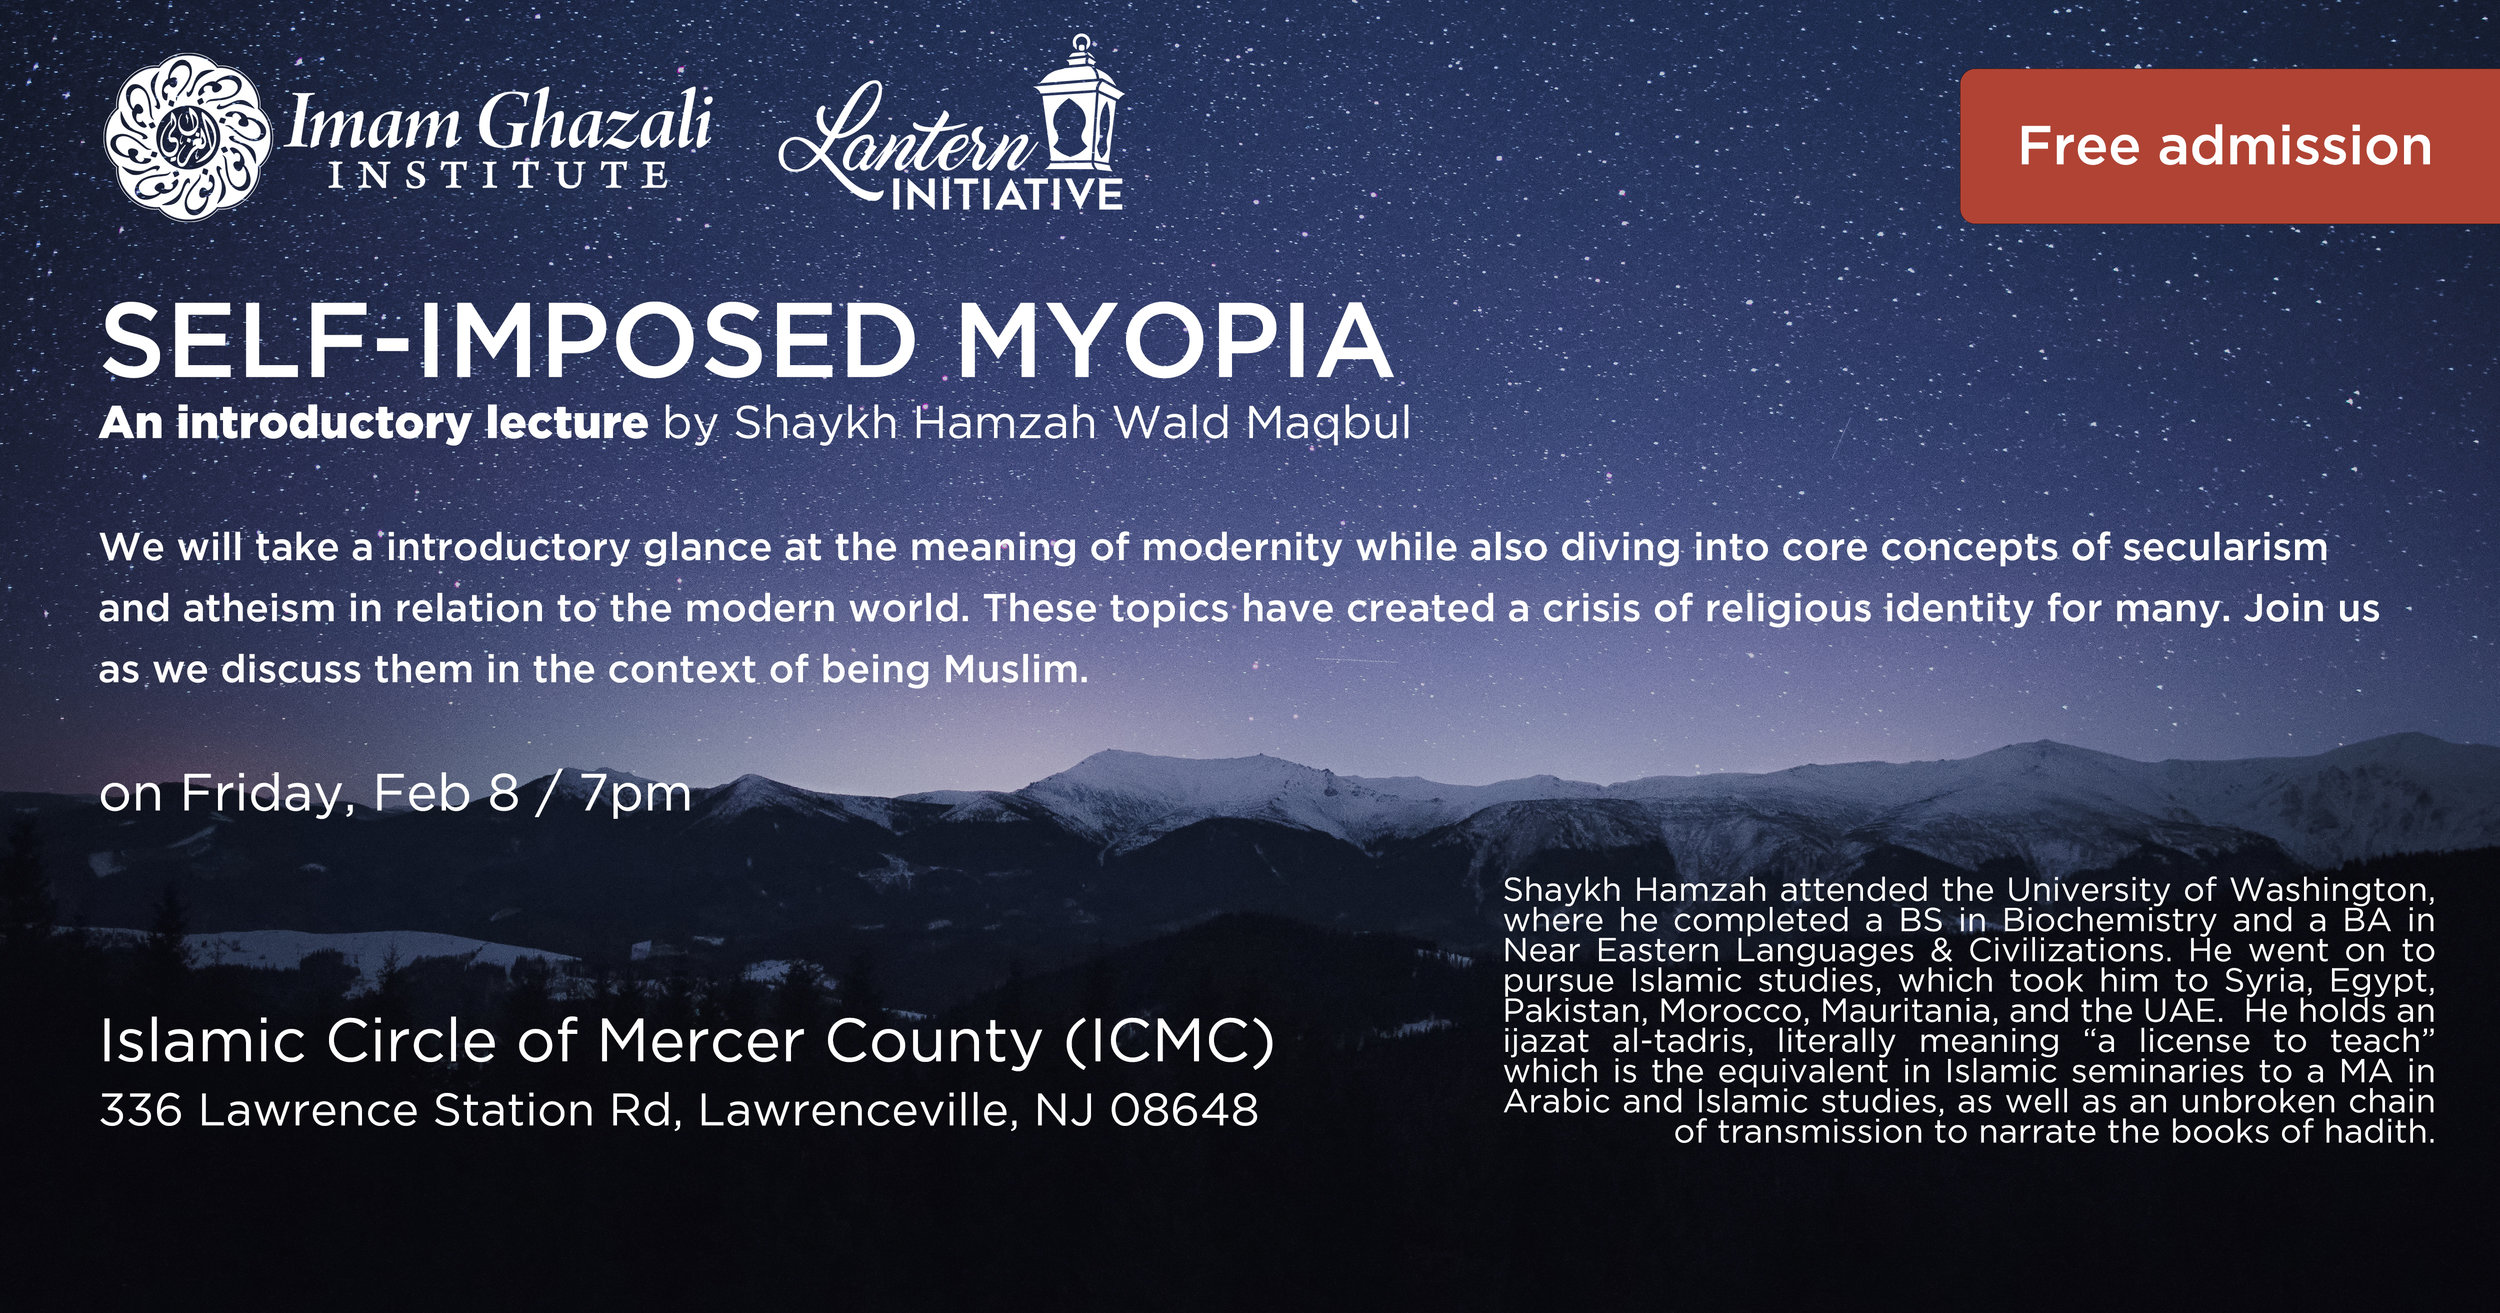 ICMC Islamic Circle Mercer New Jersey